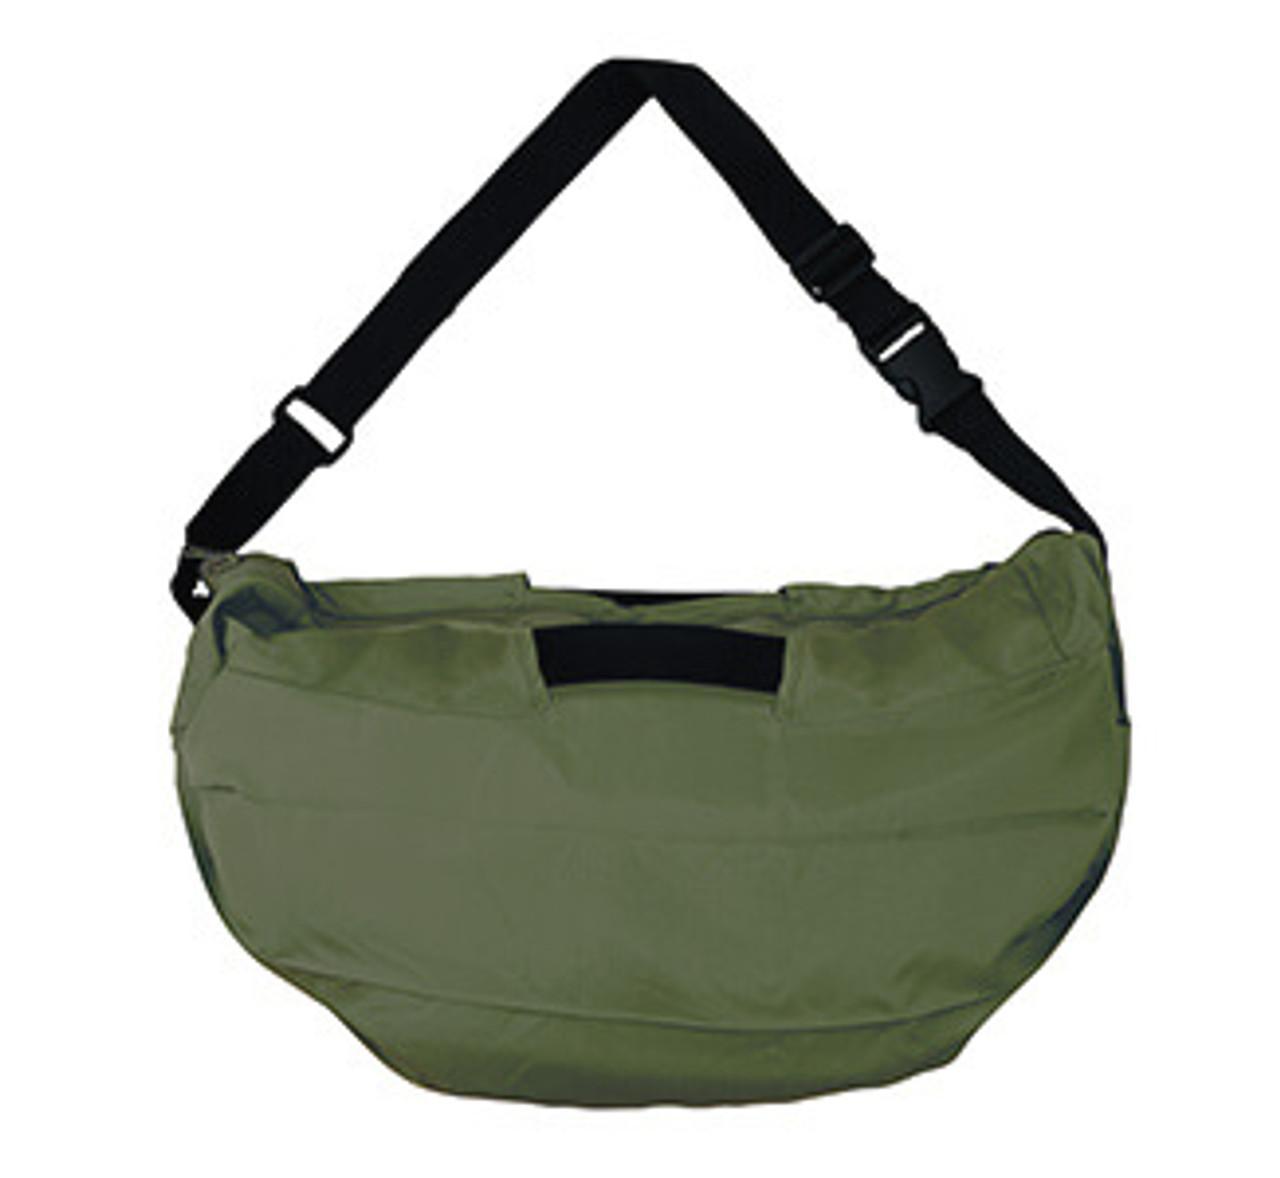 Marna Shupatto Shoulder Bag 2Way Olive Складная сумка через плечо